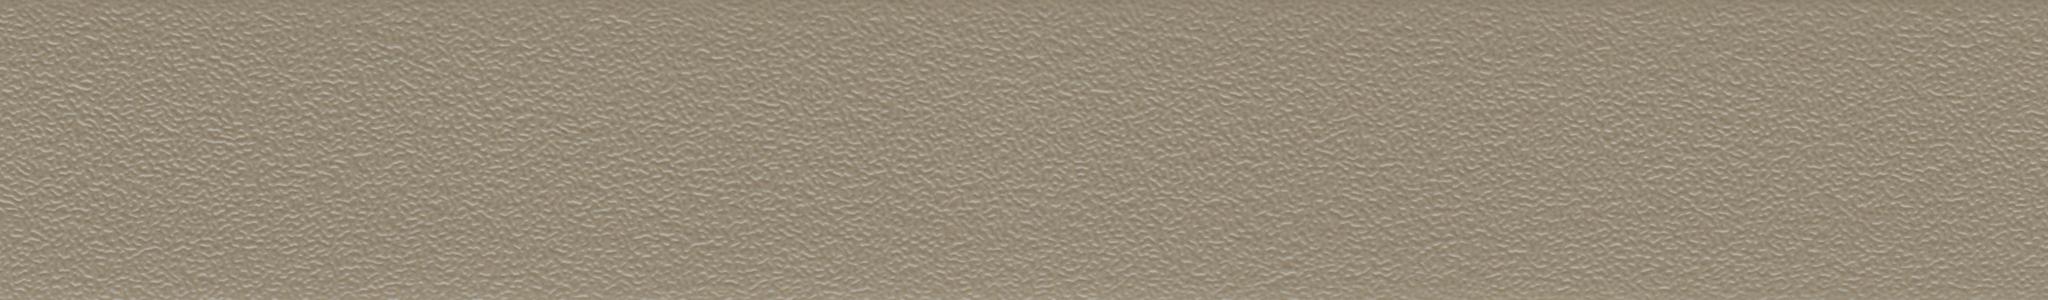 HU 182512 ABS Kante UNI Braun perl 101